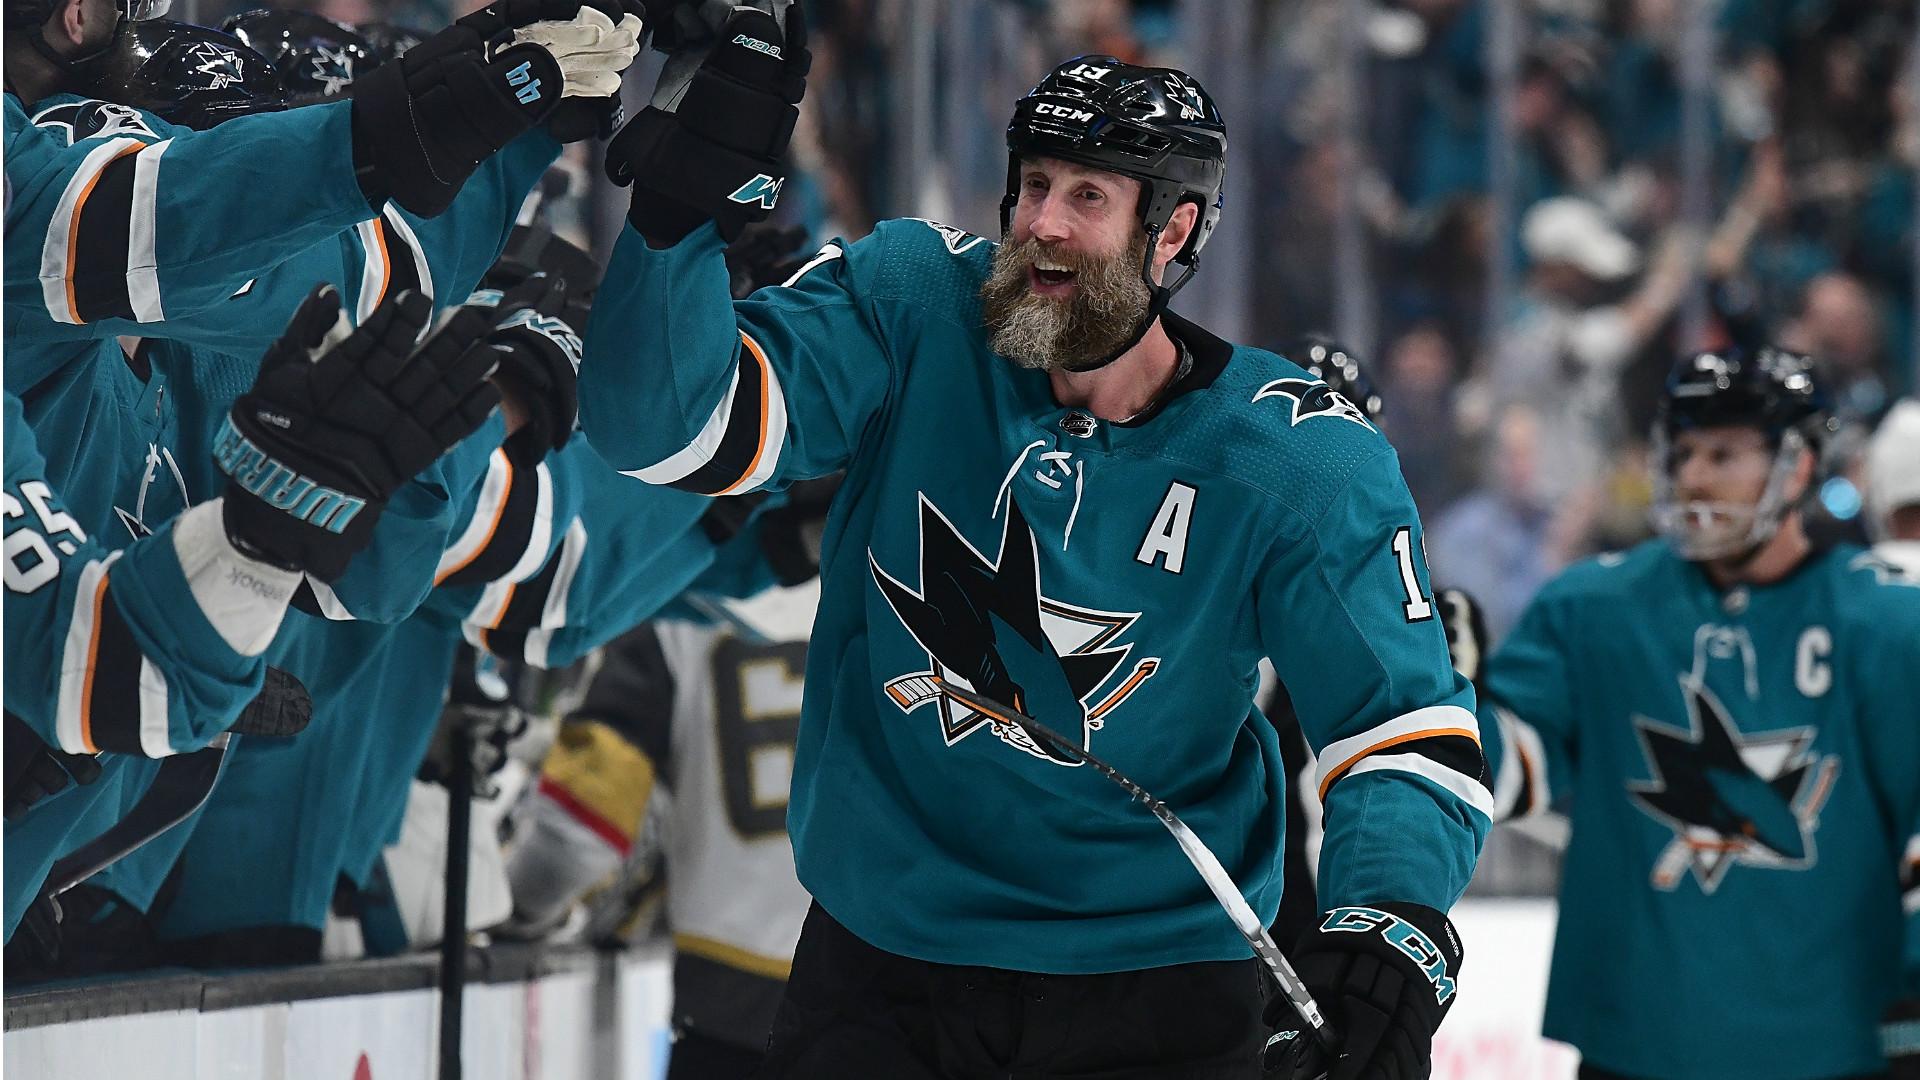 NHL playoffs 2019: Sharks forward Joe Thornton scores first